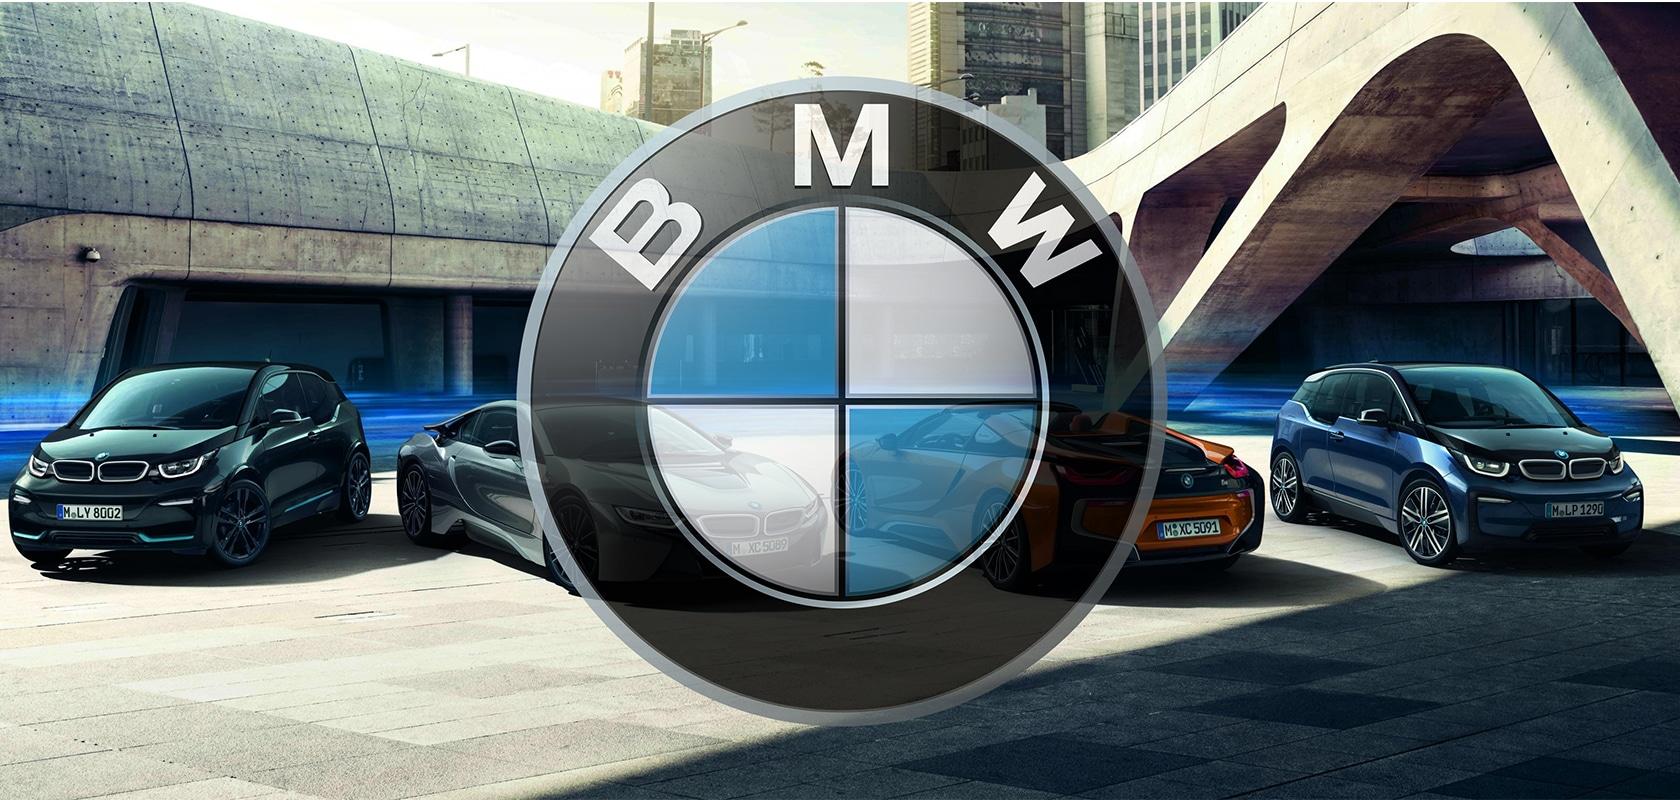 Marque BMW